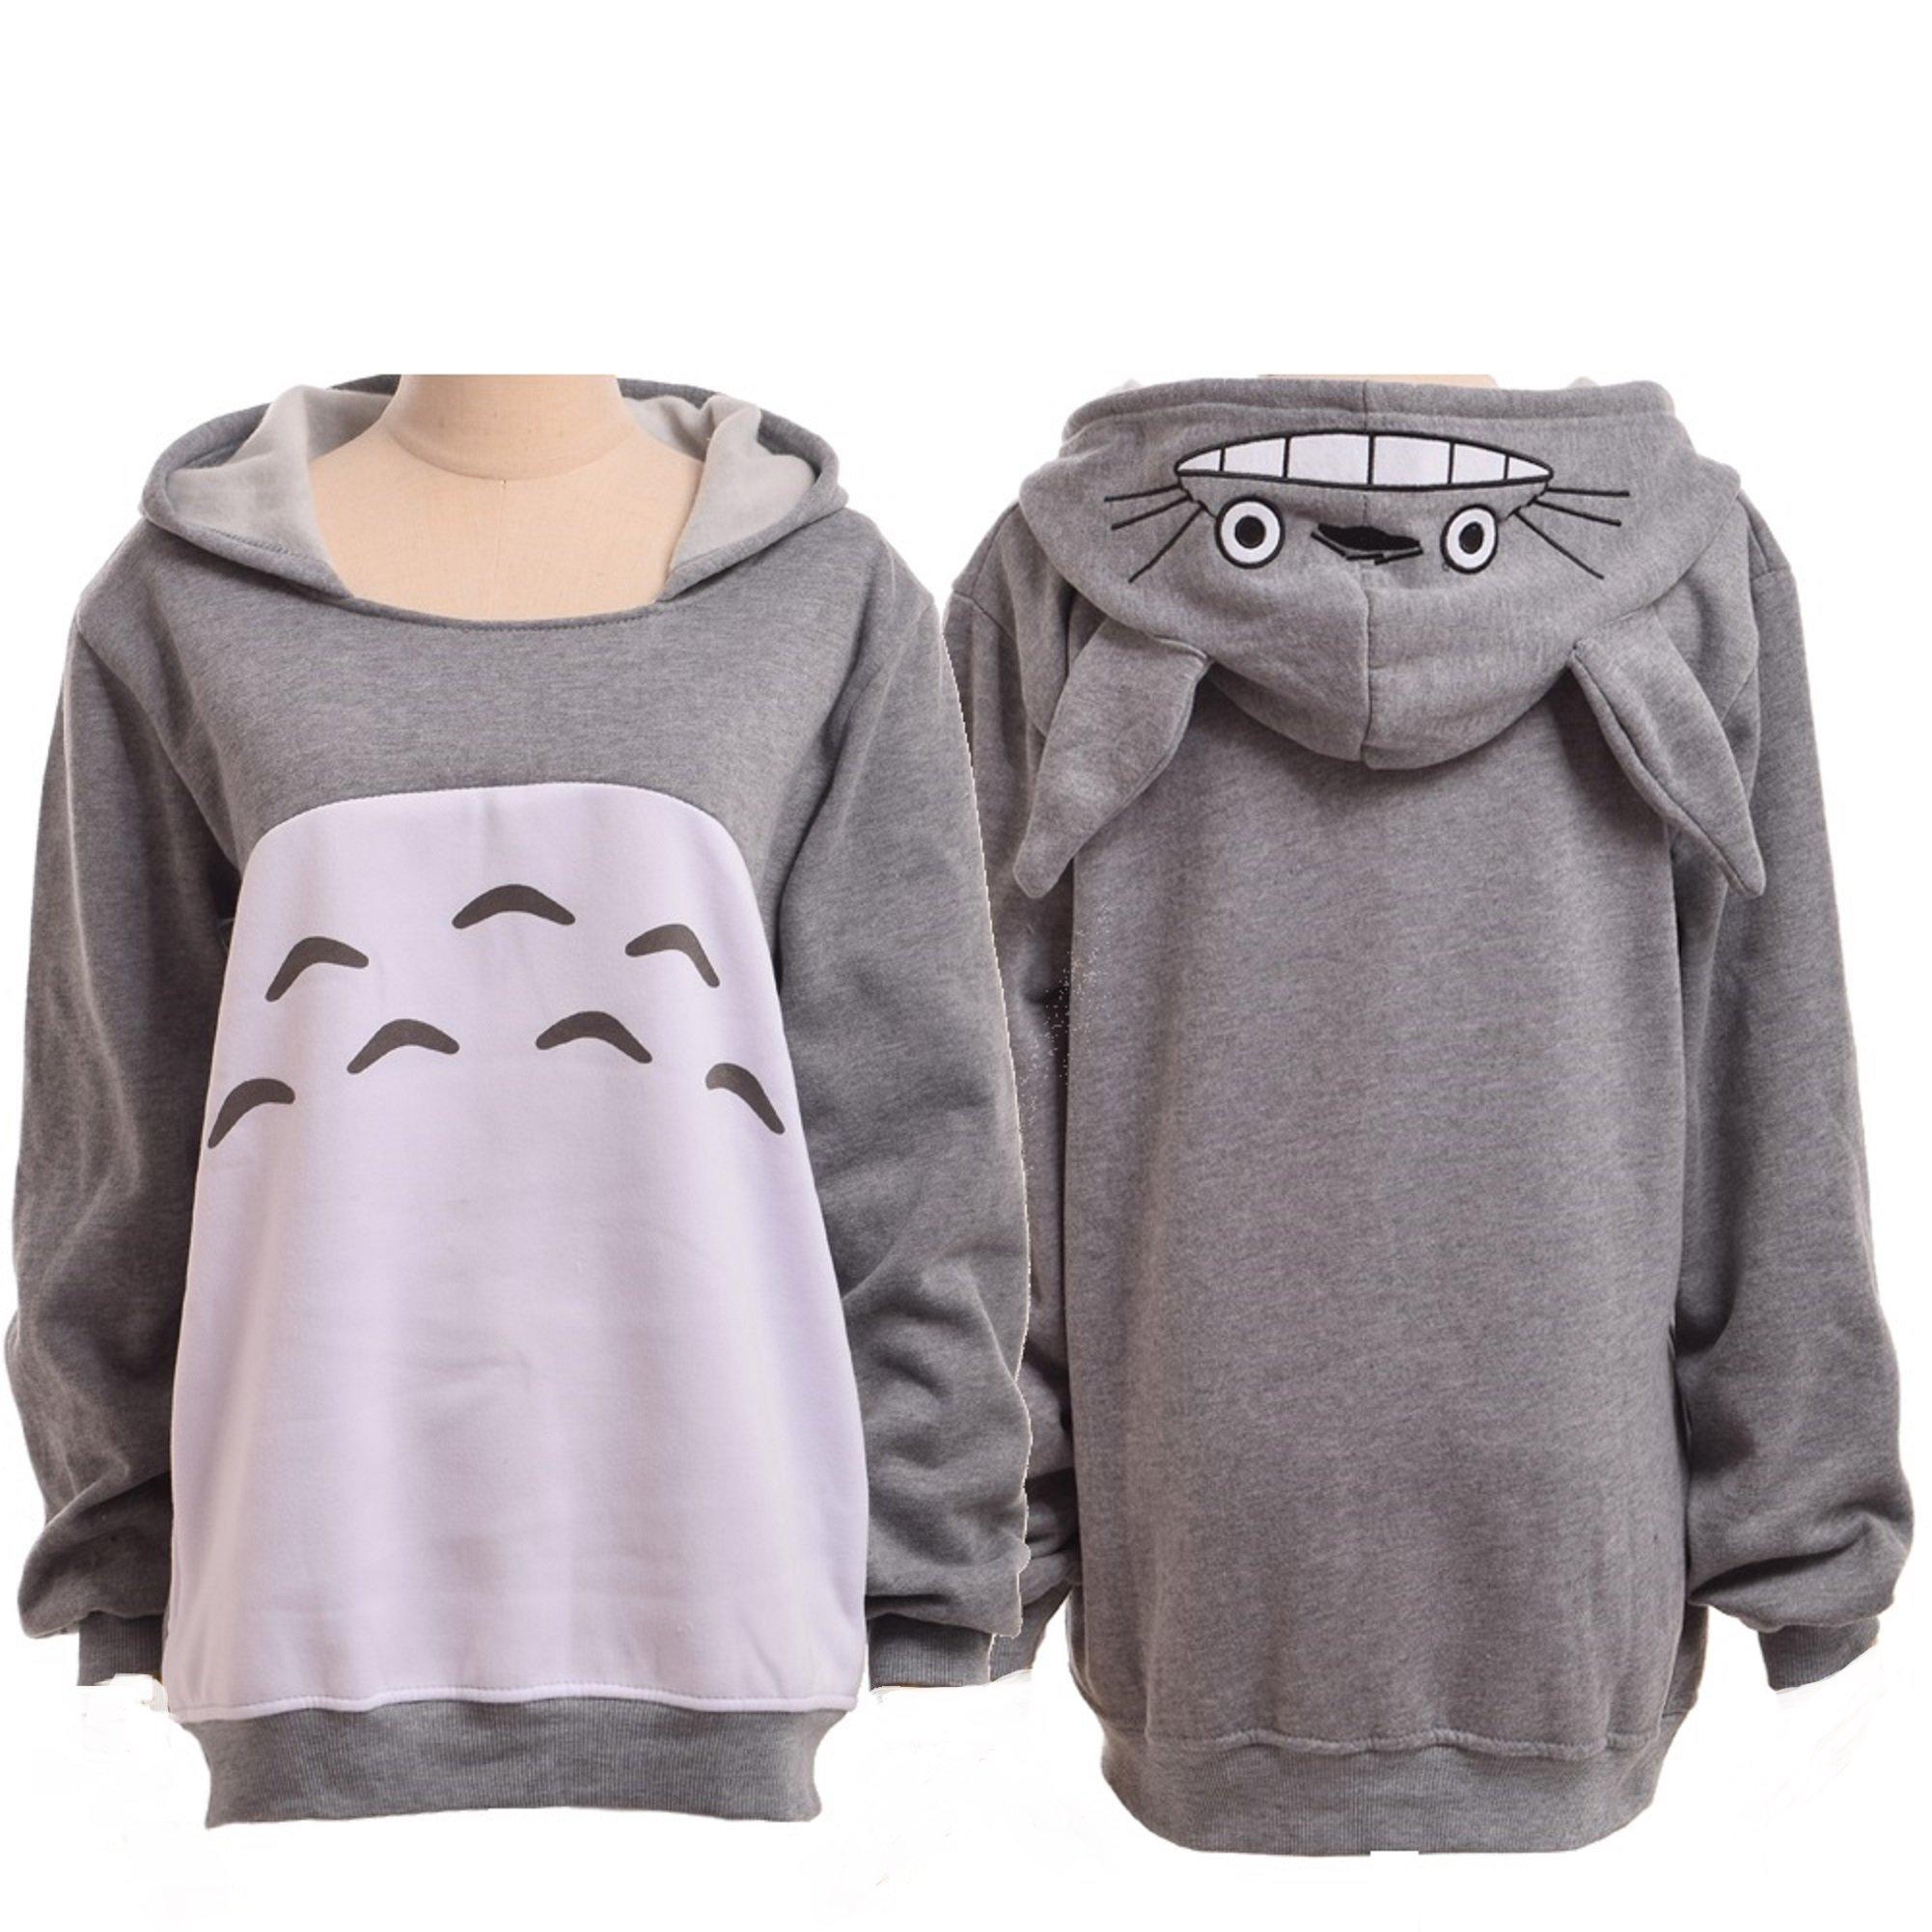 Double Villages Unisex Anime Sweater Shirt My Neighbor Totoro Long Sleeve Fleece Hooded Sweatershirt with Ears Grey(M)